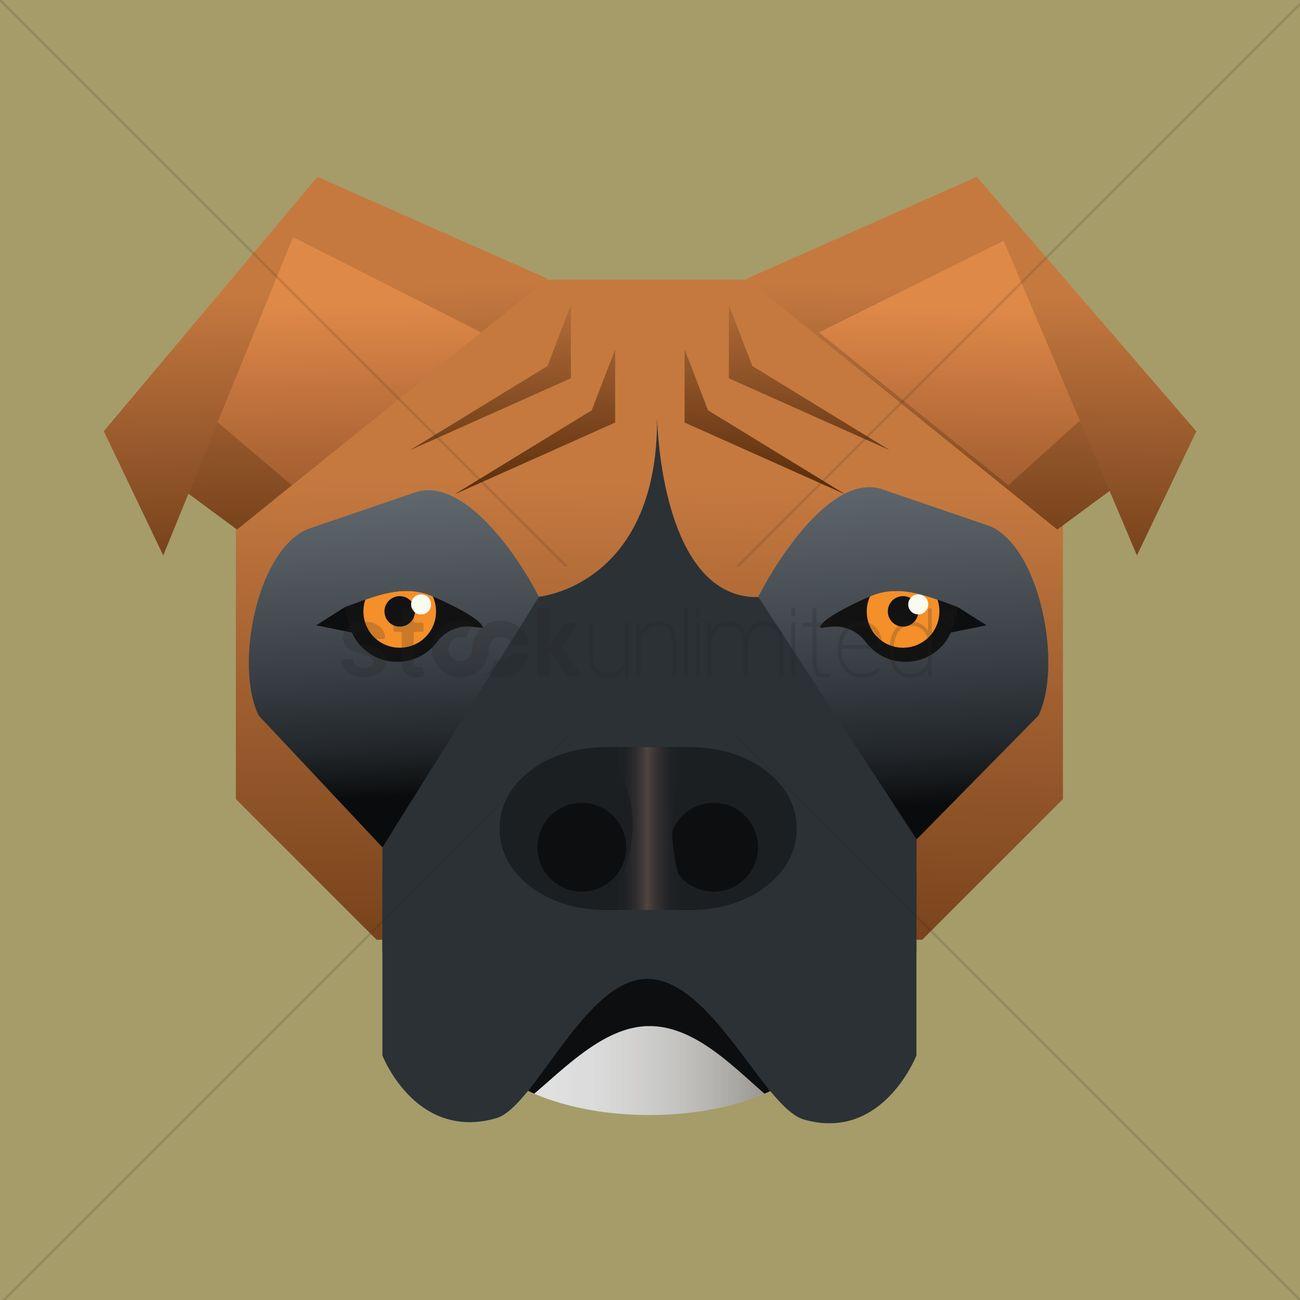 1300x1300 Free Bulldog Vector Image